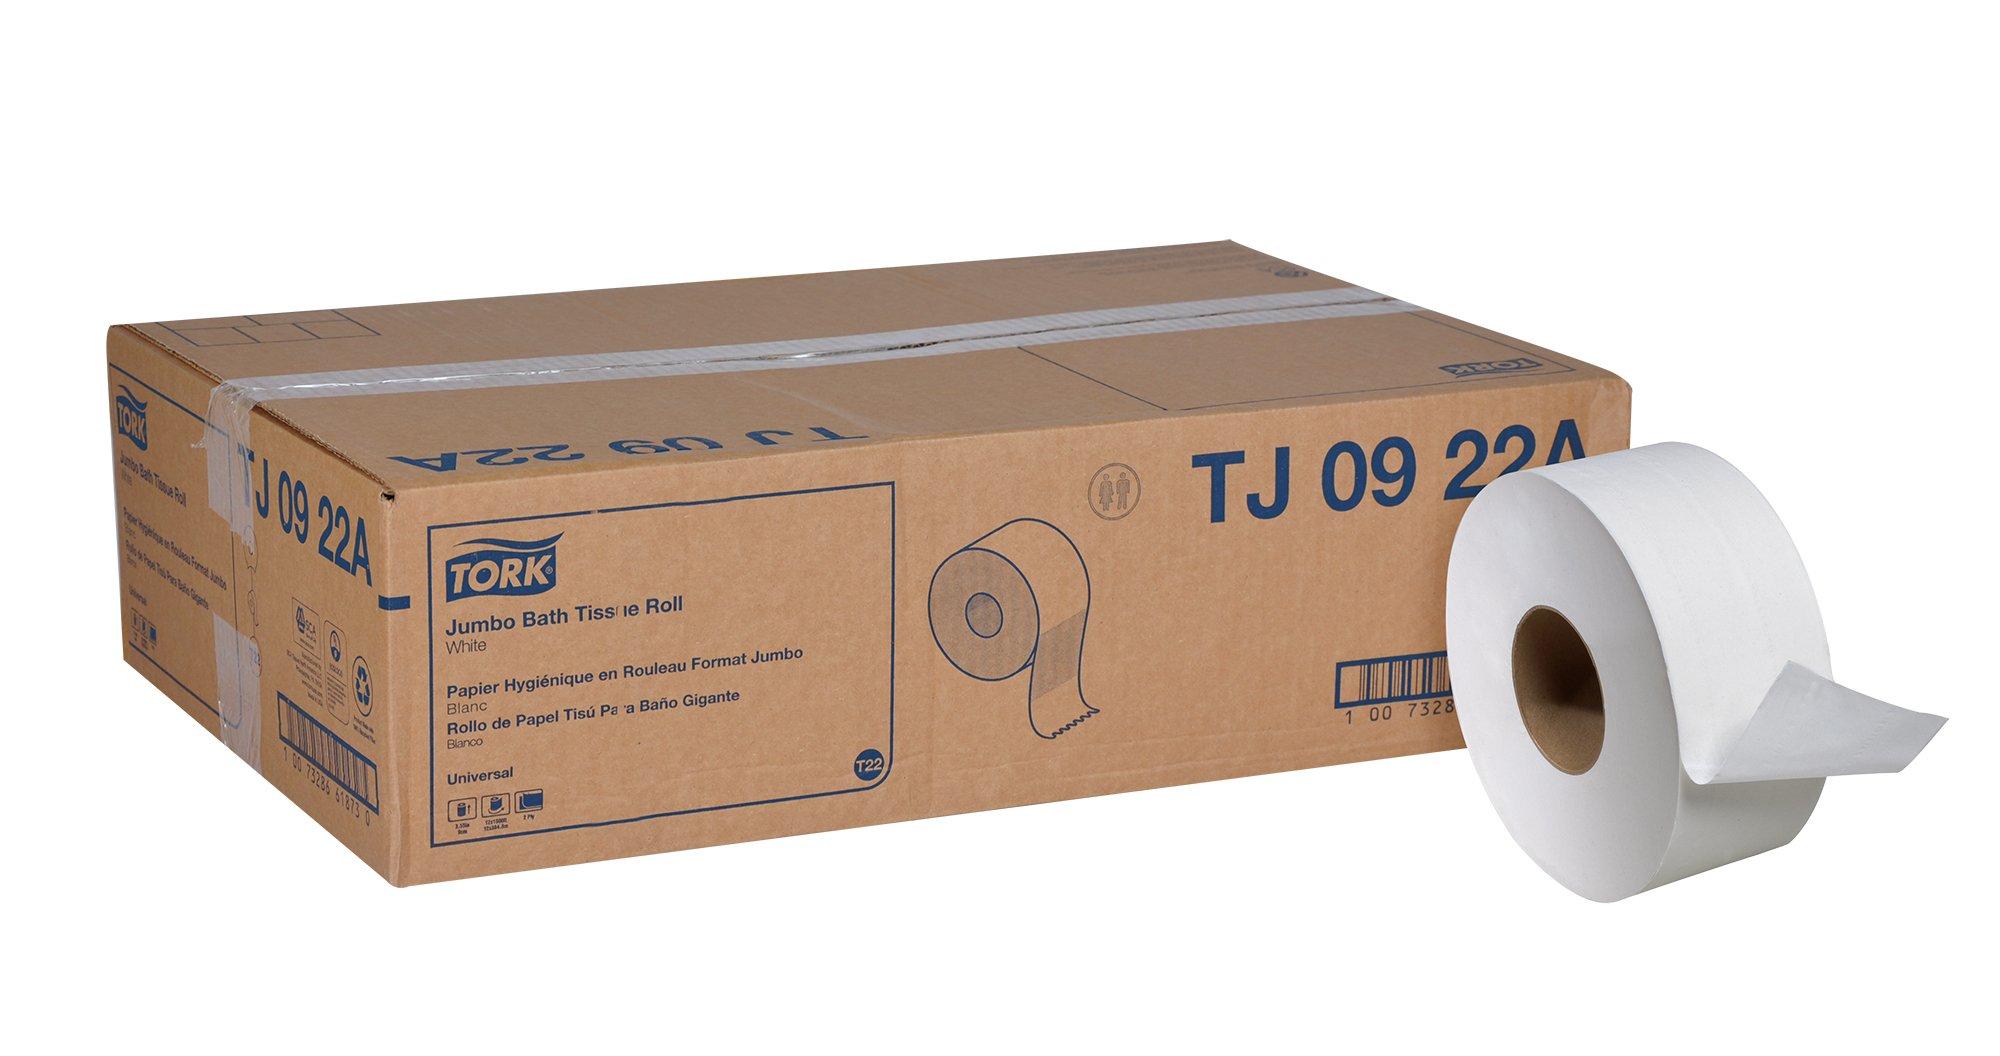 Tork TJ0922A Universal Jumbo Bath Tissue, 2-Ply, White, 3.6'' x 1000 ft, 8.8'' Diameter (Case of 12)